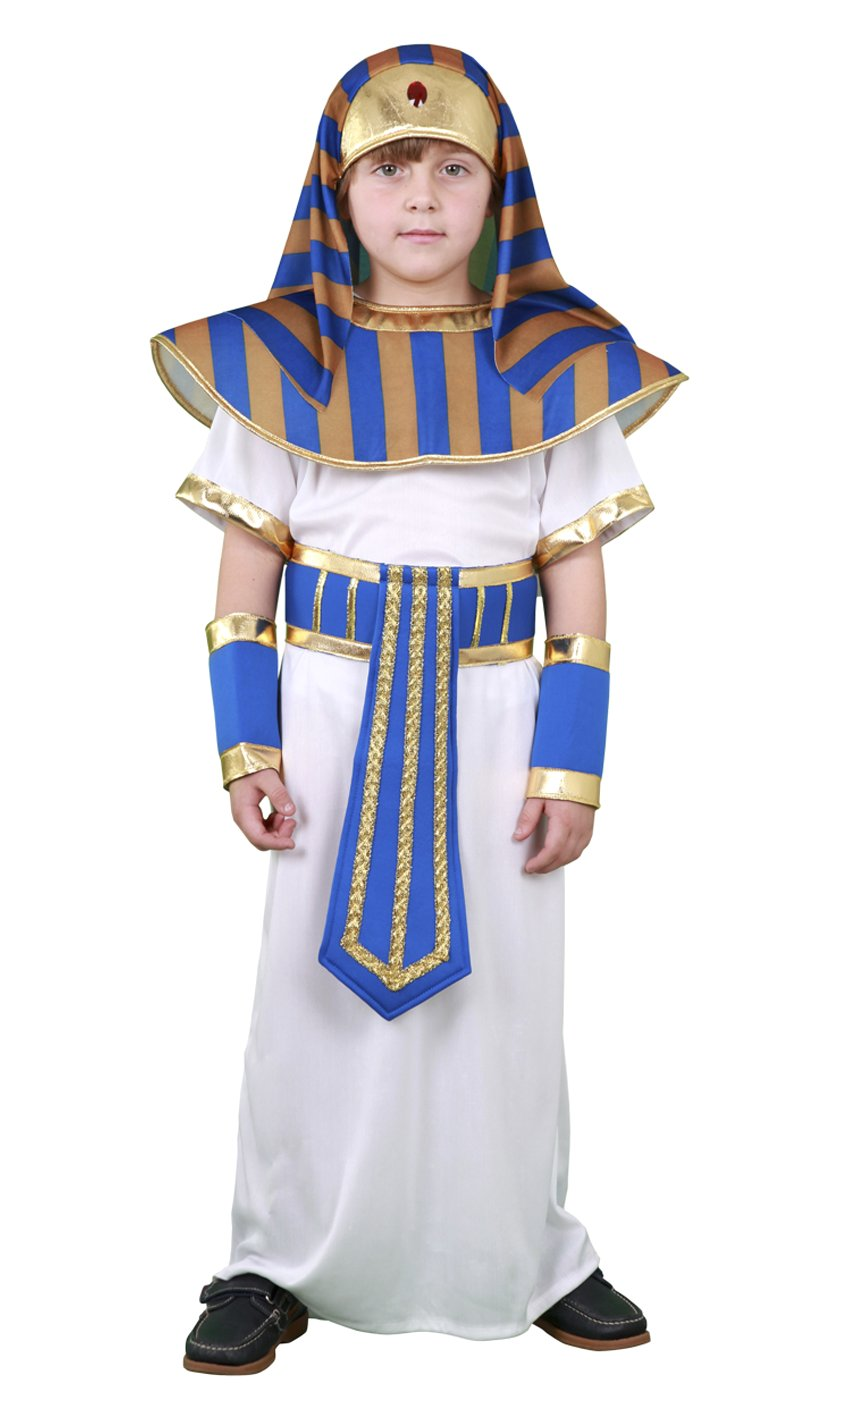 Costume-Pharaon-Garçon